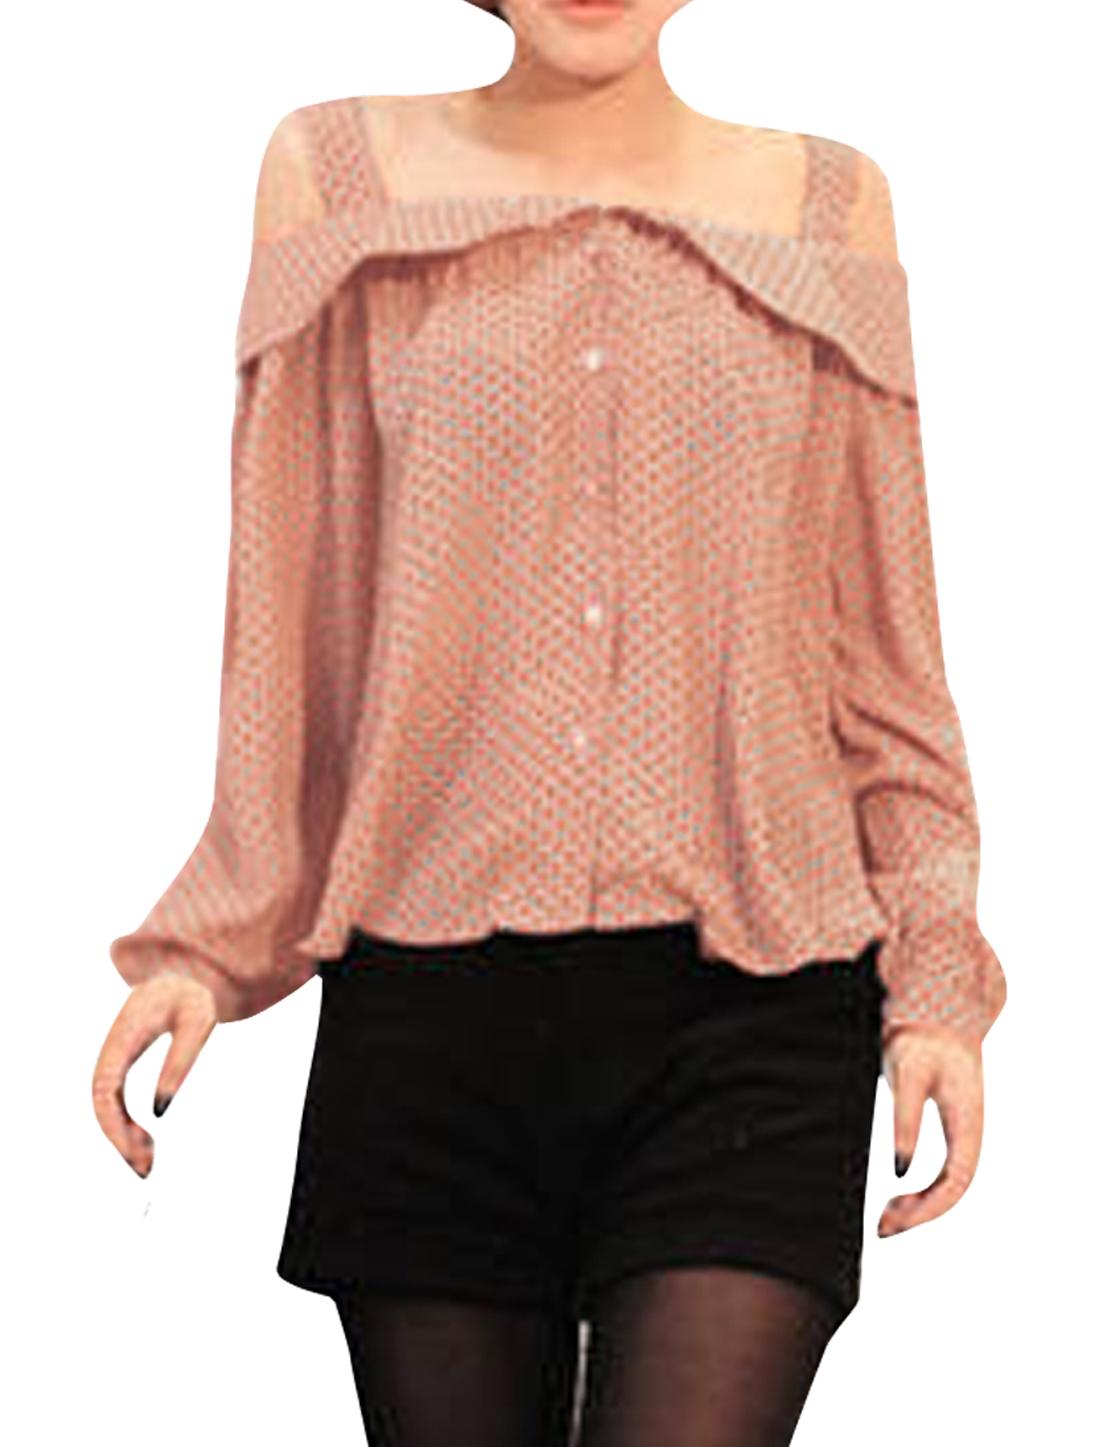 Lady Fashion Pink Shoulder Straps Design Butterfly Prints Blouse XL